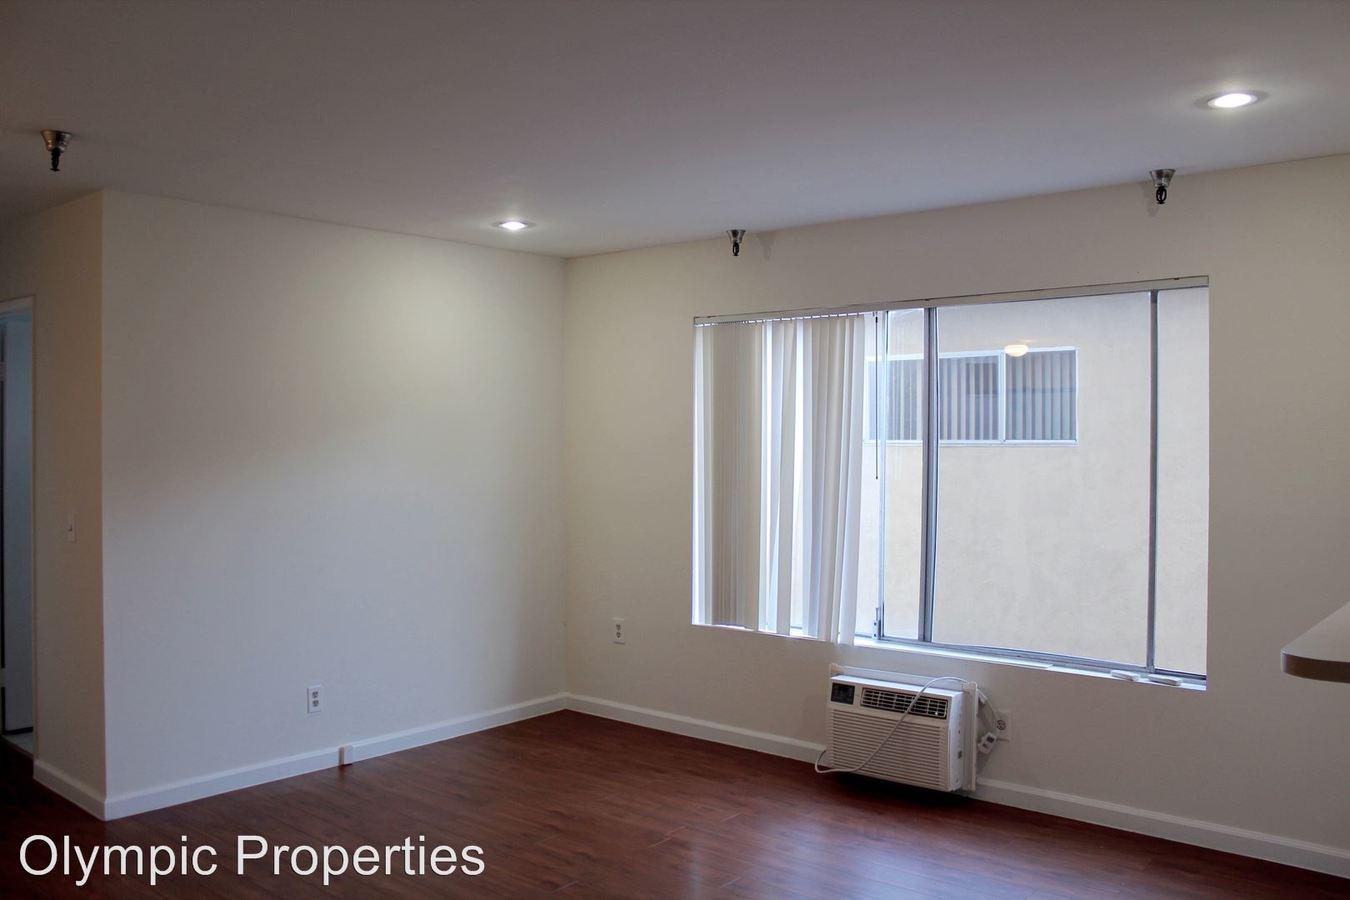 2 Bedrooms 2 Bathrooms Apartment for rent at 3746 Mentone Avenue in Los Angeles, CA